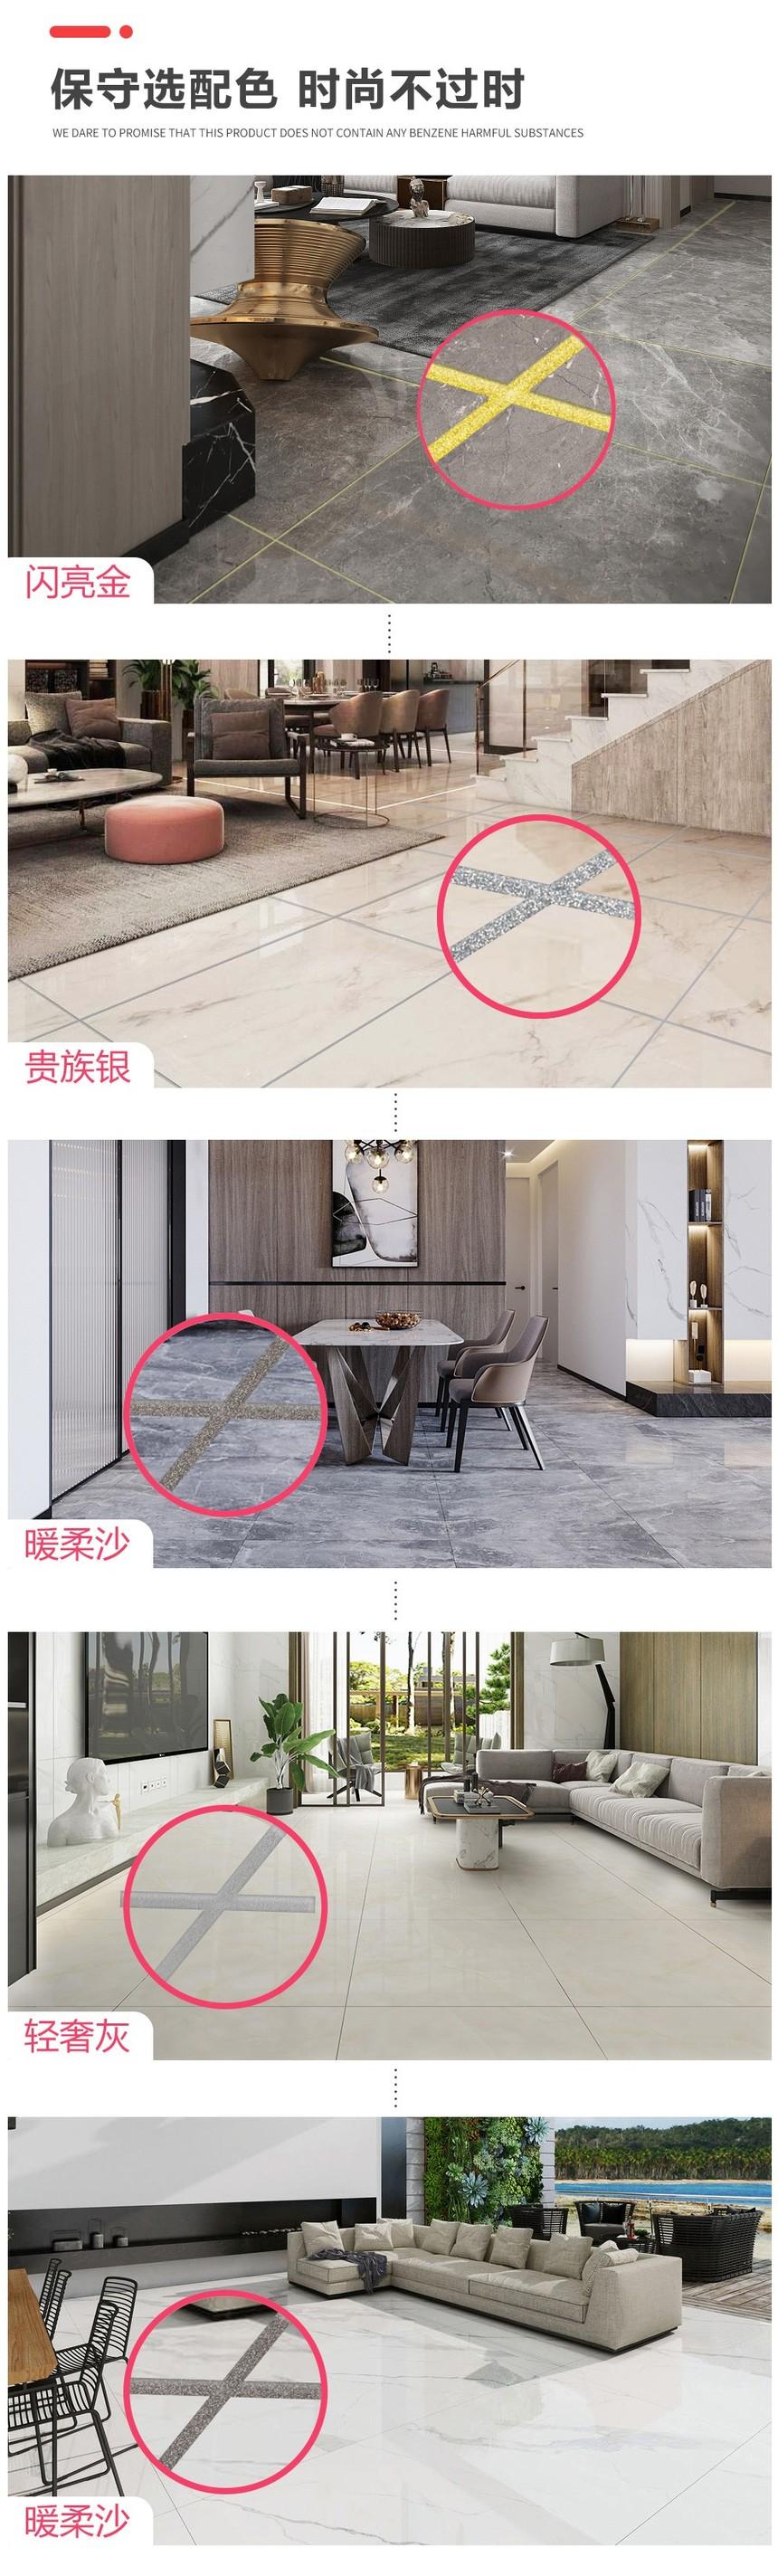 DIY美缝详情页-0603-定稿(1)_11.jpg